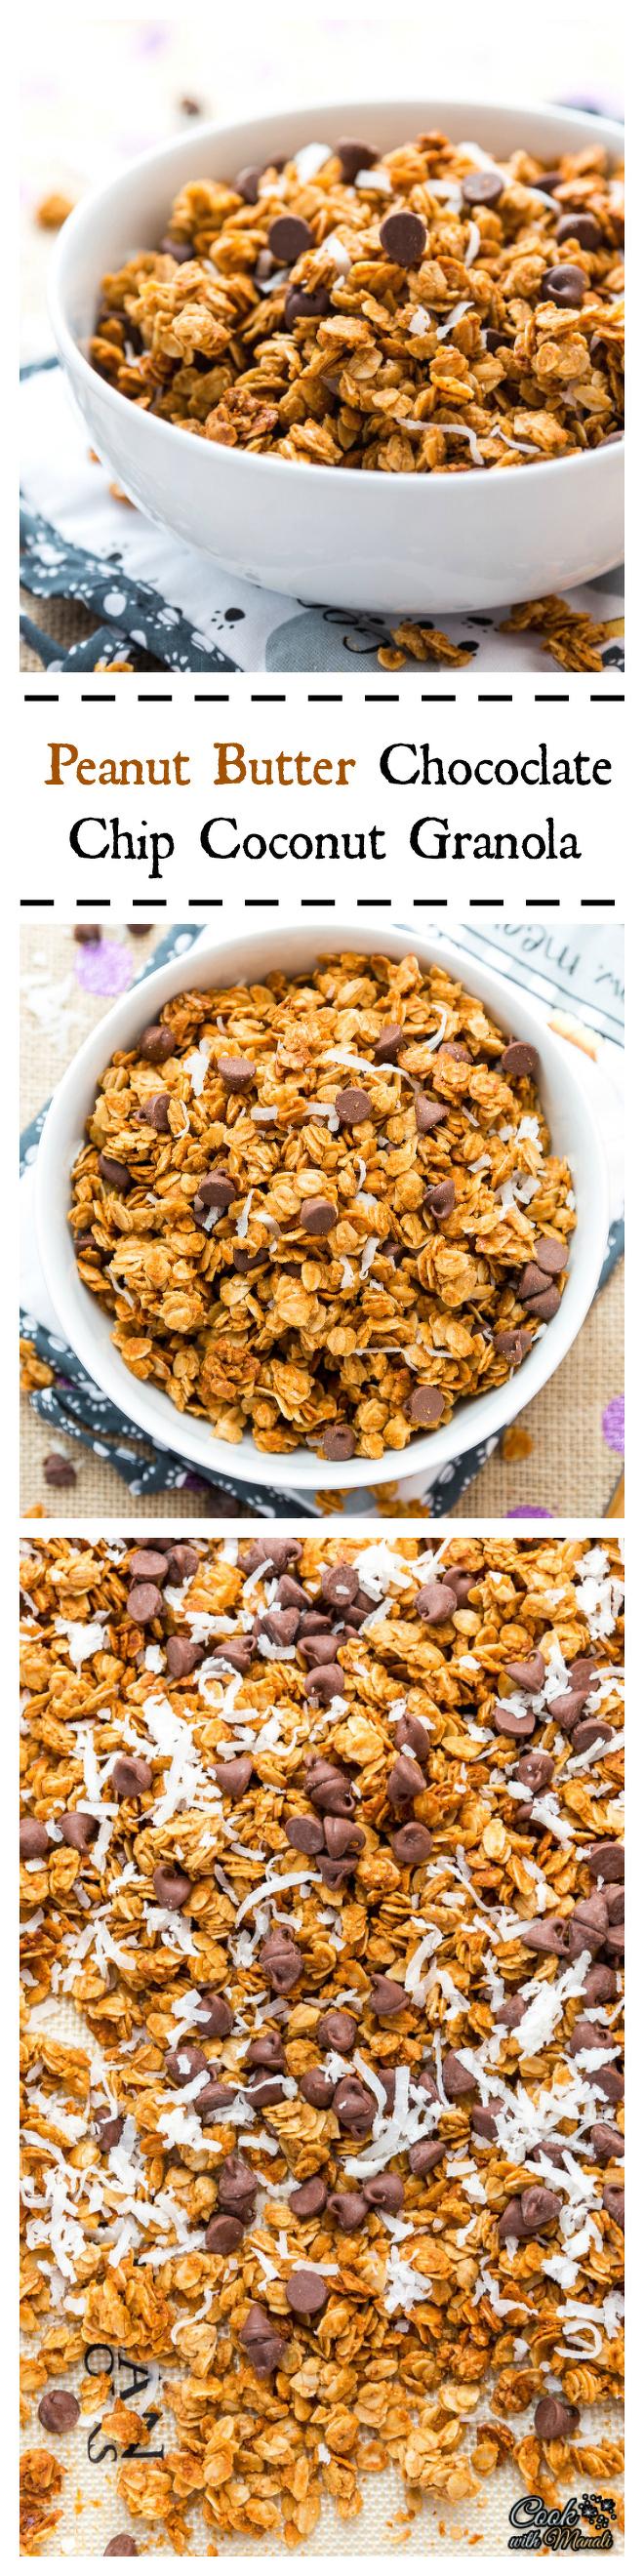 Peanut Butter Chocolate Chip Coconut Granola Collage-nocwm